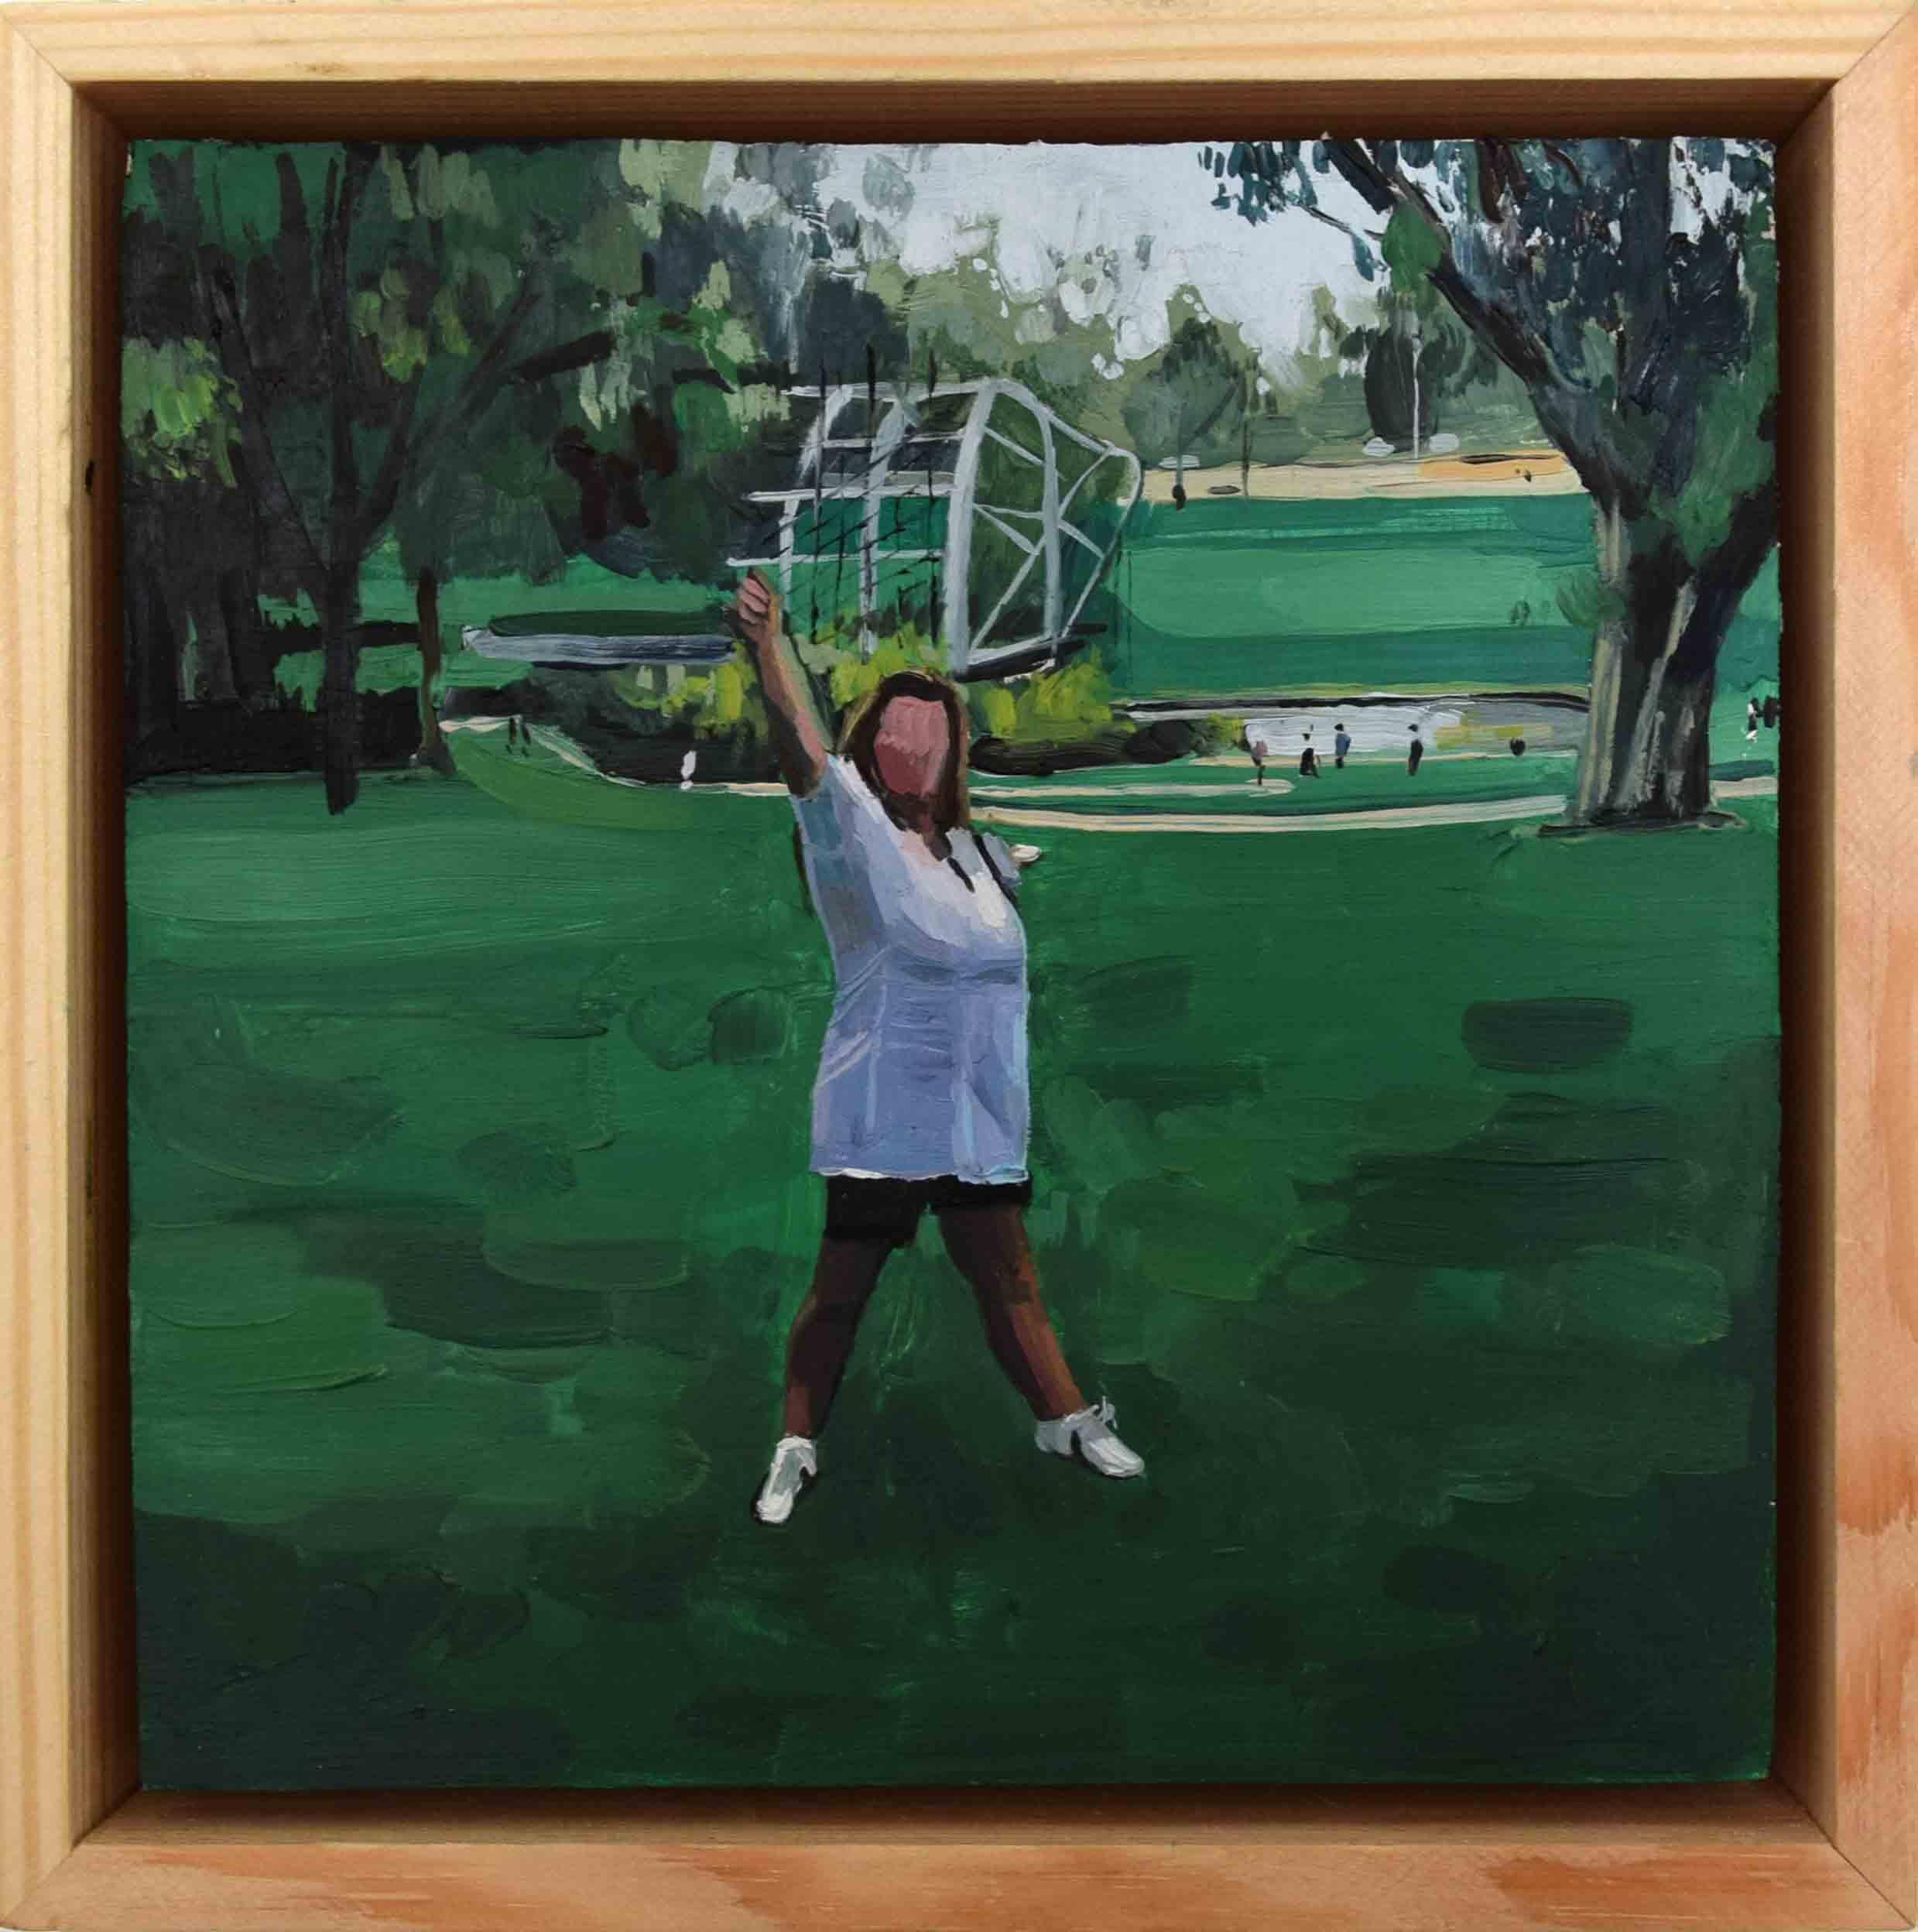 13. Ellen Norrish,  @pantenu7727 Come stiamo bene!!!! , 2019, oil on board, 15 x 15 cm $260